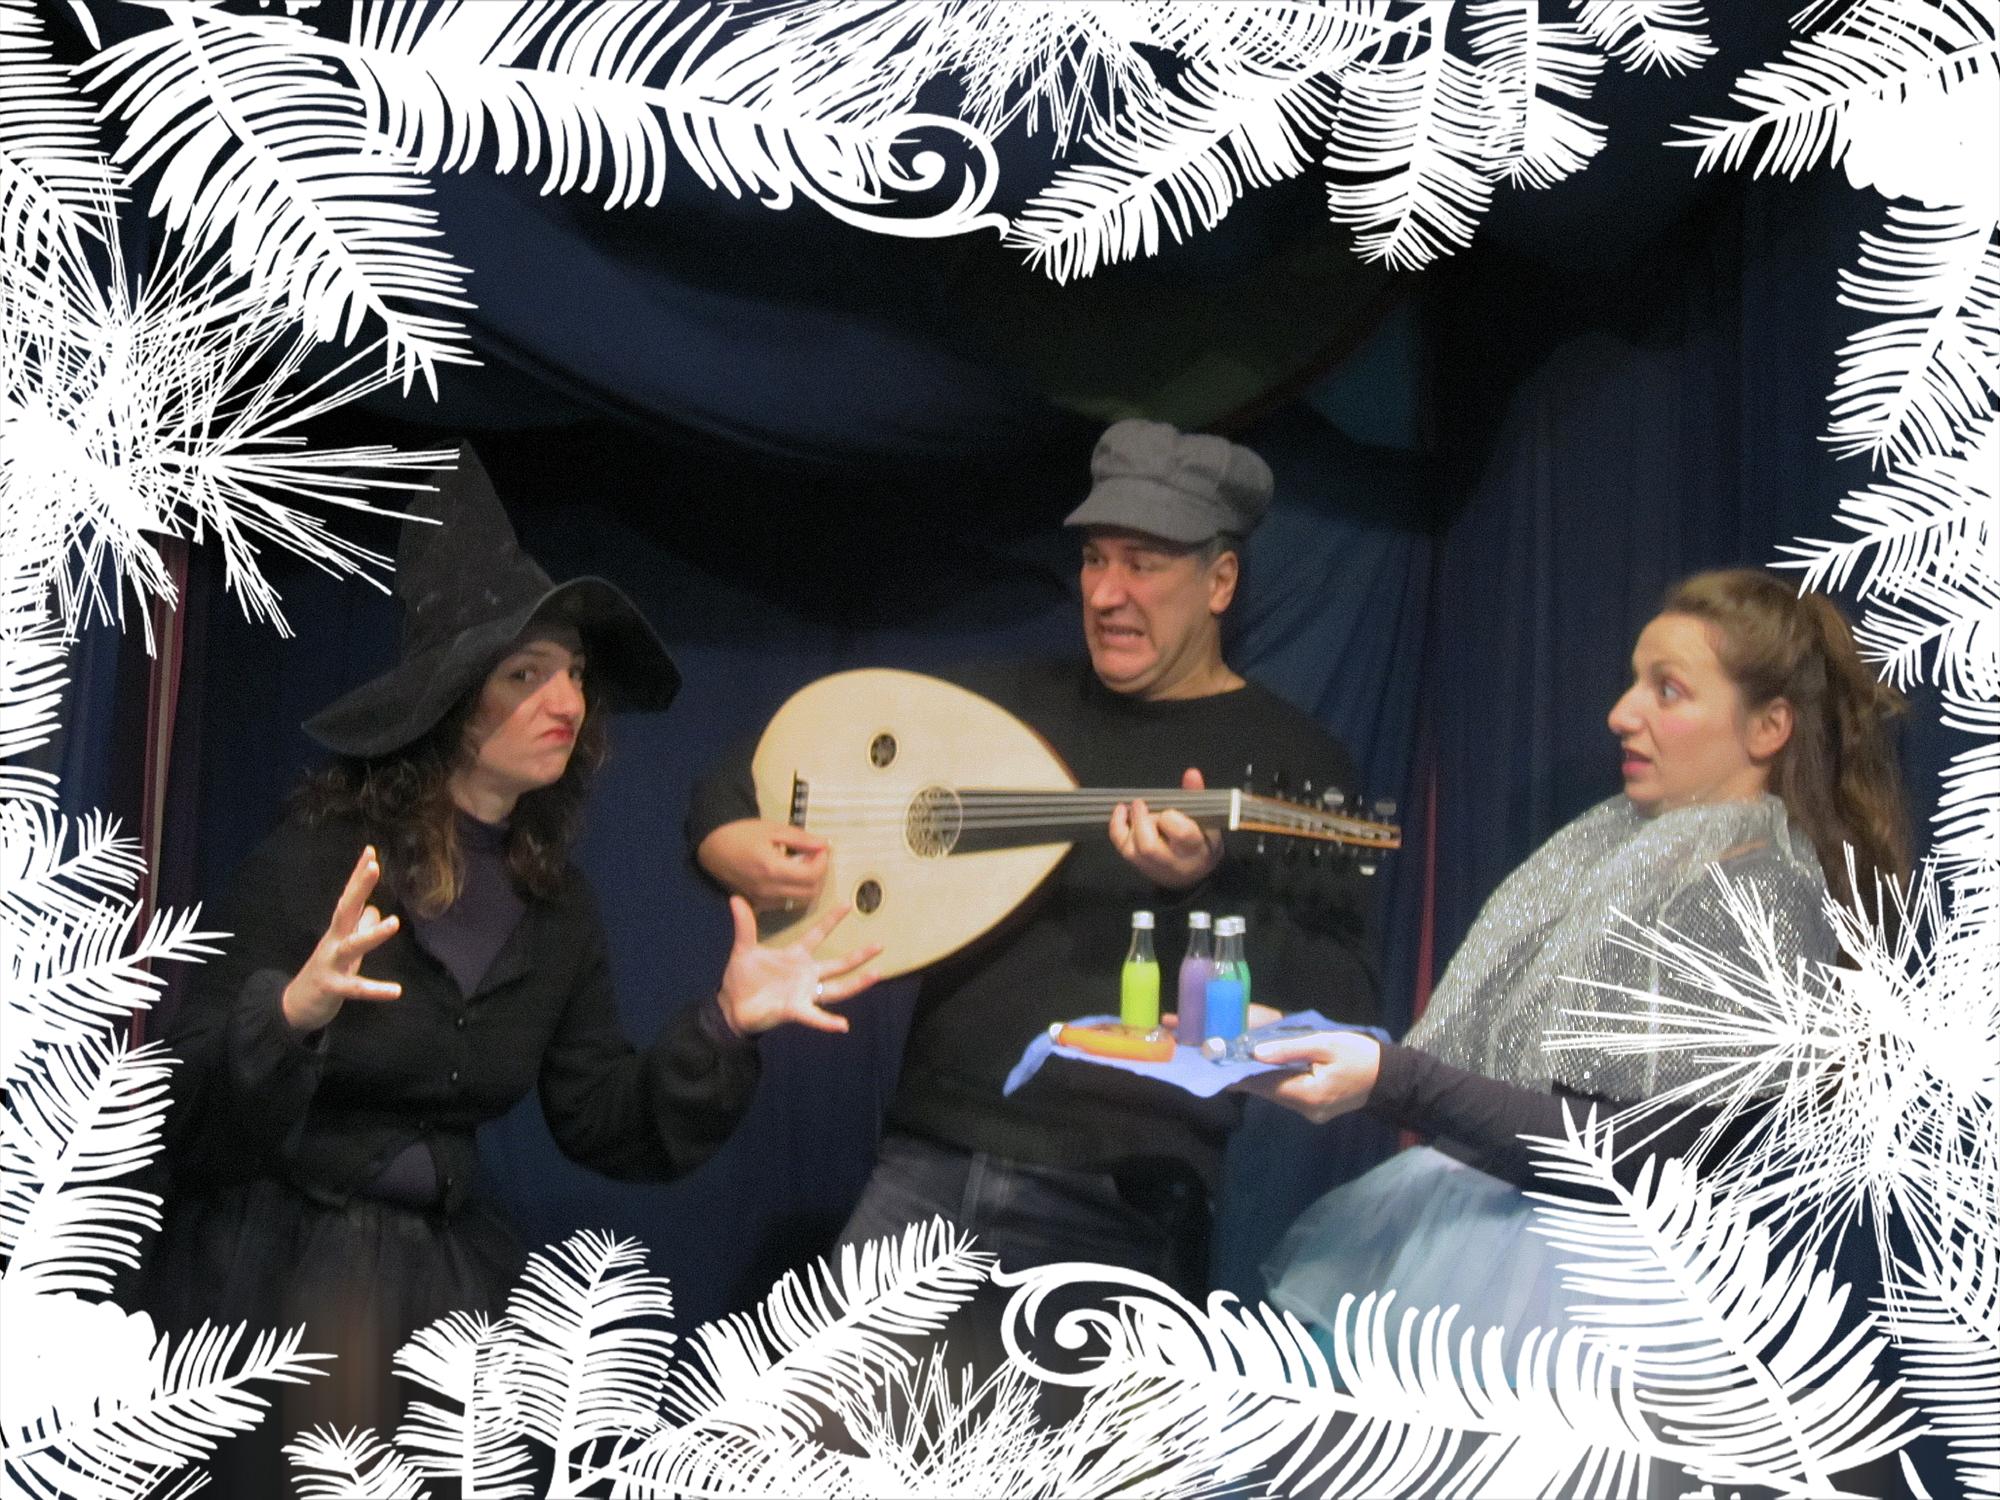 H Mάγισσα Κατσουφώ και το εύθυμο χωριό των Χριστουγέννων